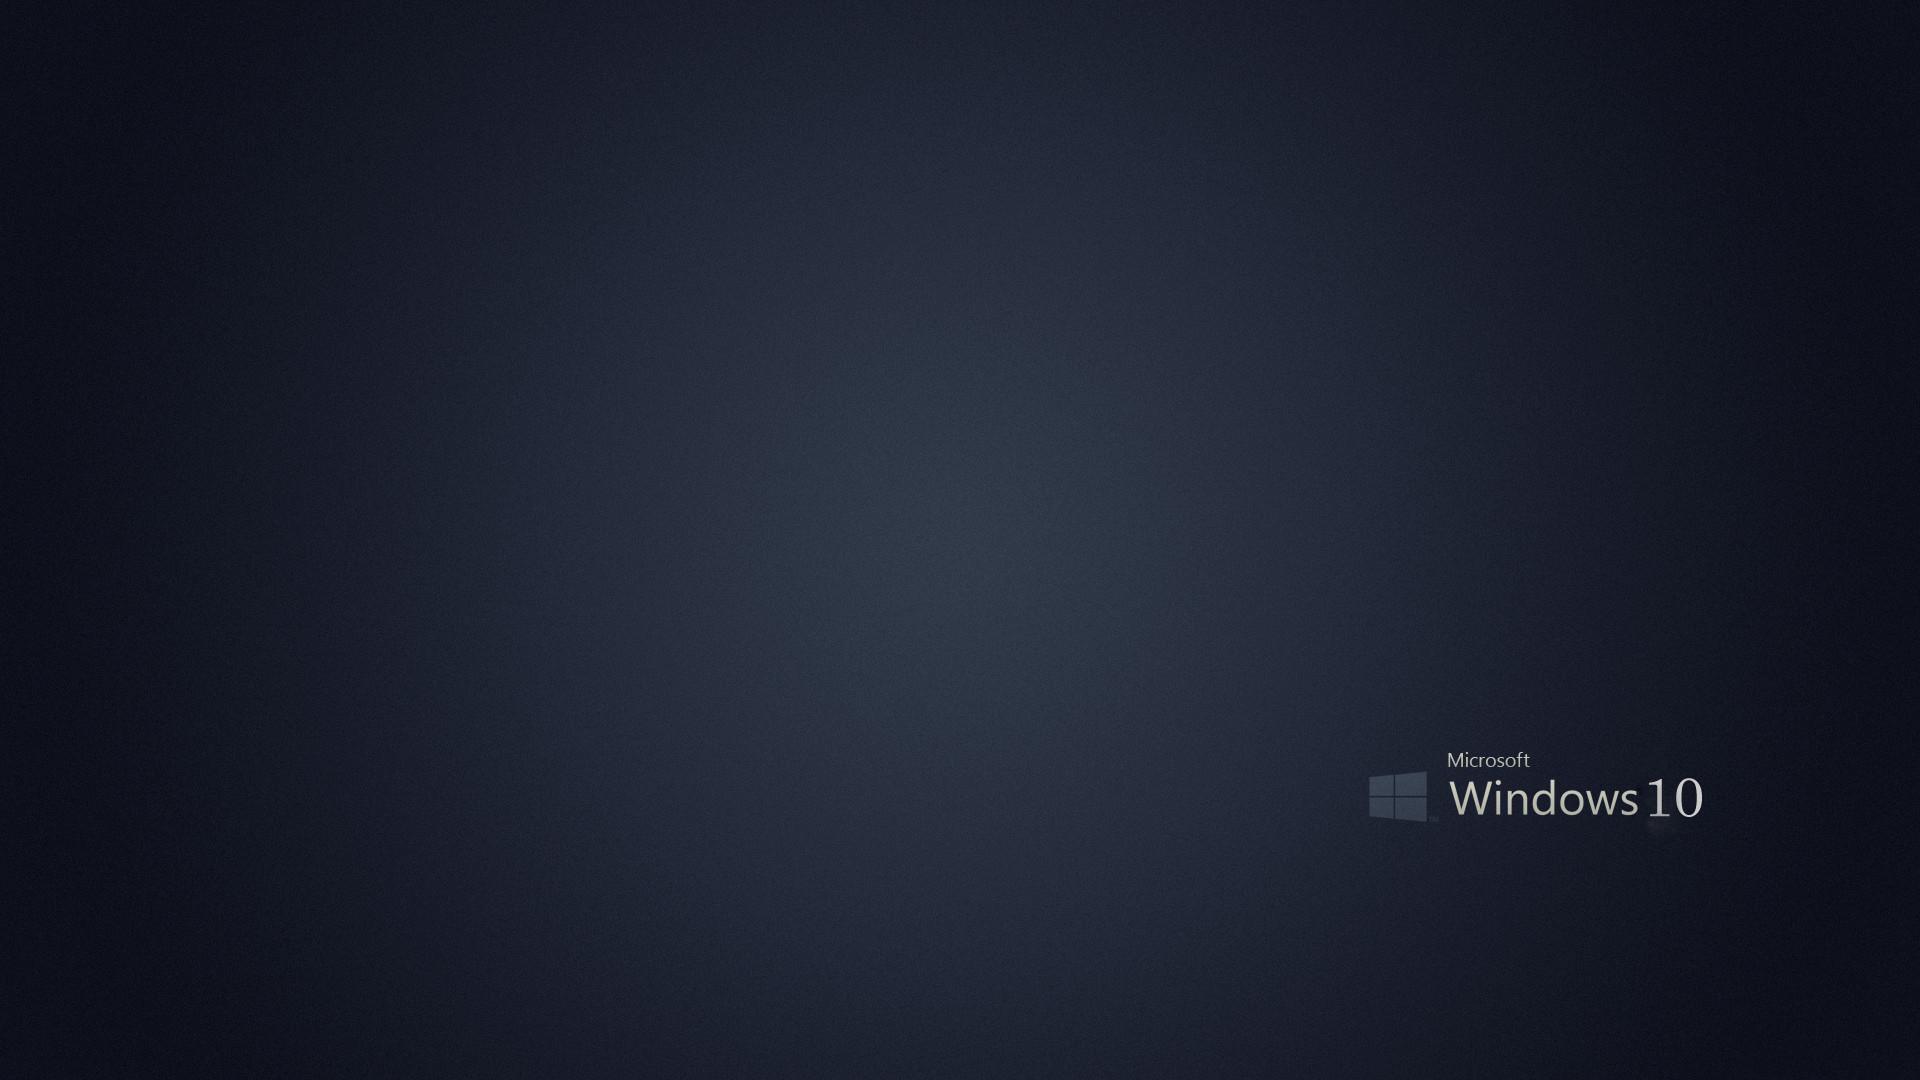 Microsoft Windows 10 Gray Background wallpaper | Best HD Wallpapers